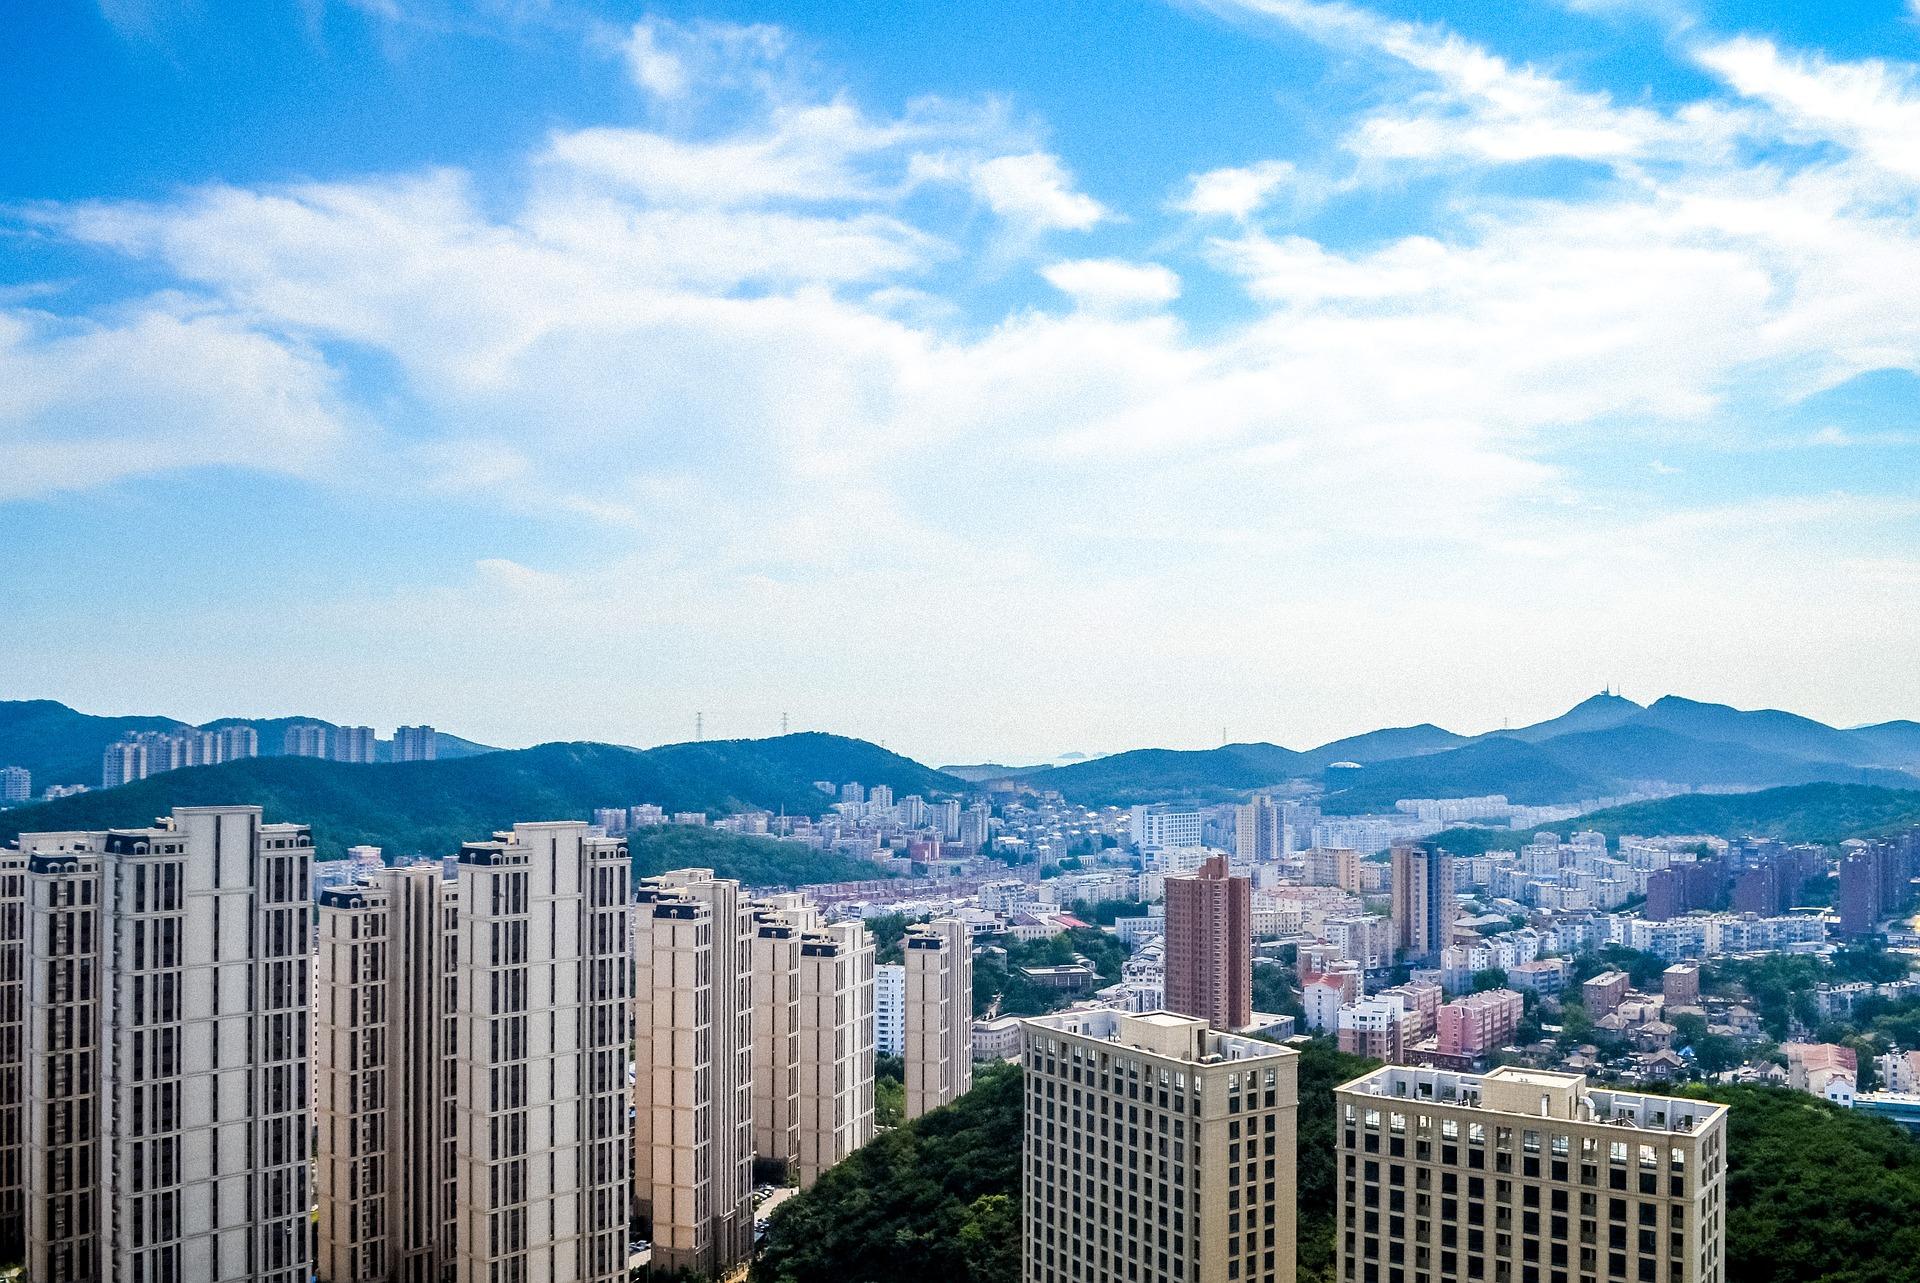 City of Dalian, China